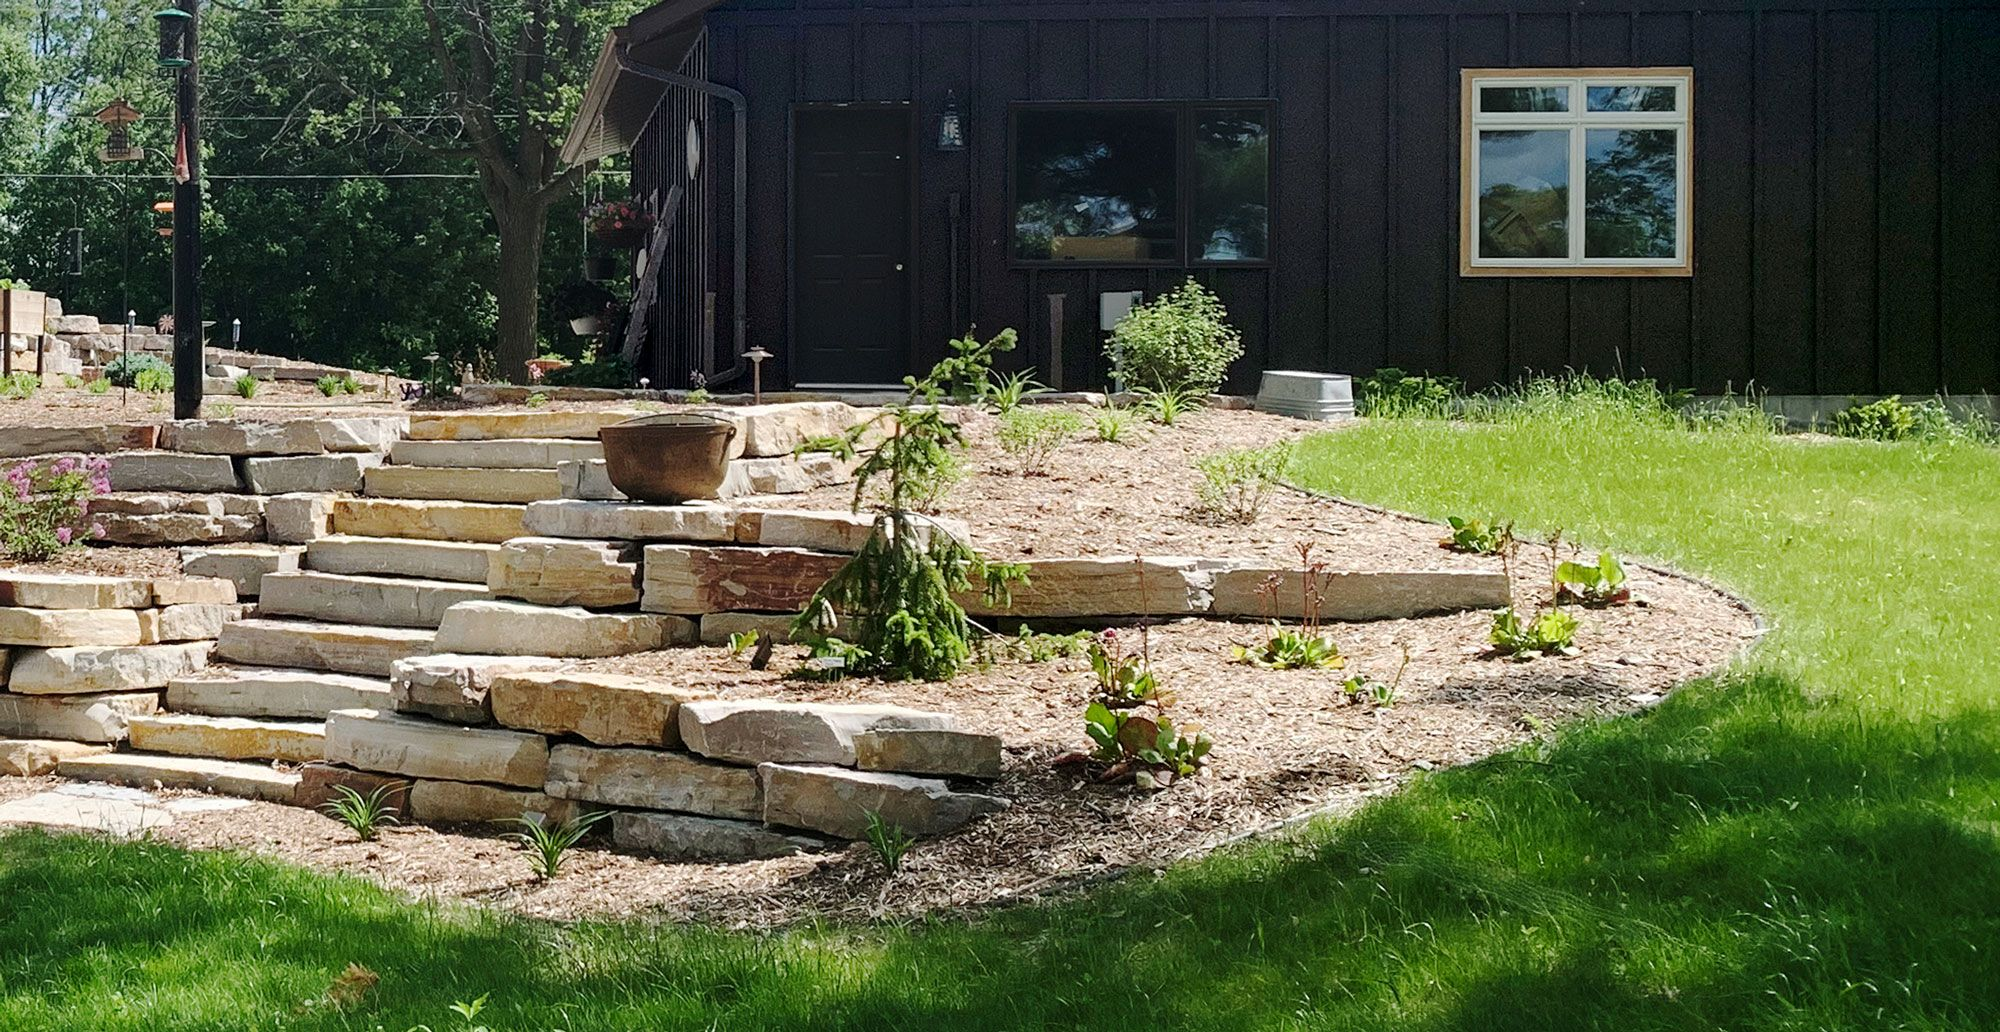 Chilton Stone Outcroppings Retaining Wall Stone Steps Landscape Design Hardscape Backyard Stone Wall Landscape Design